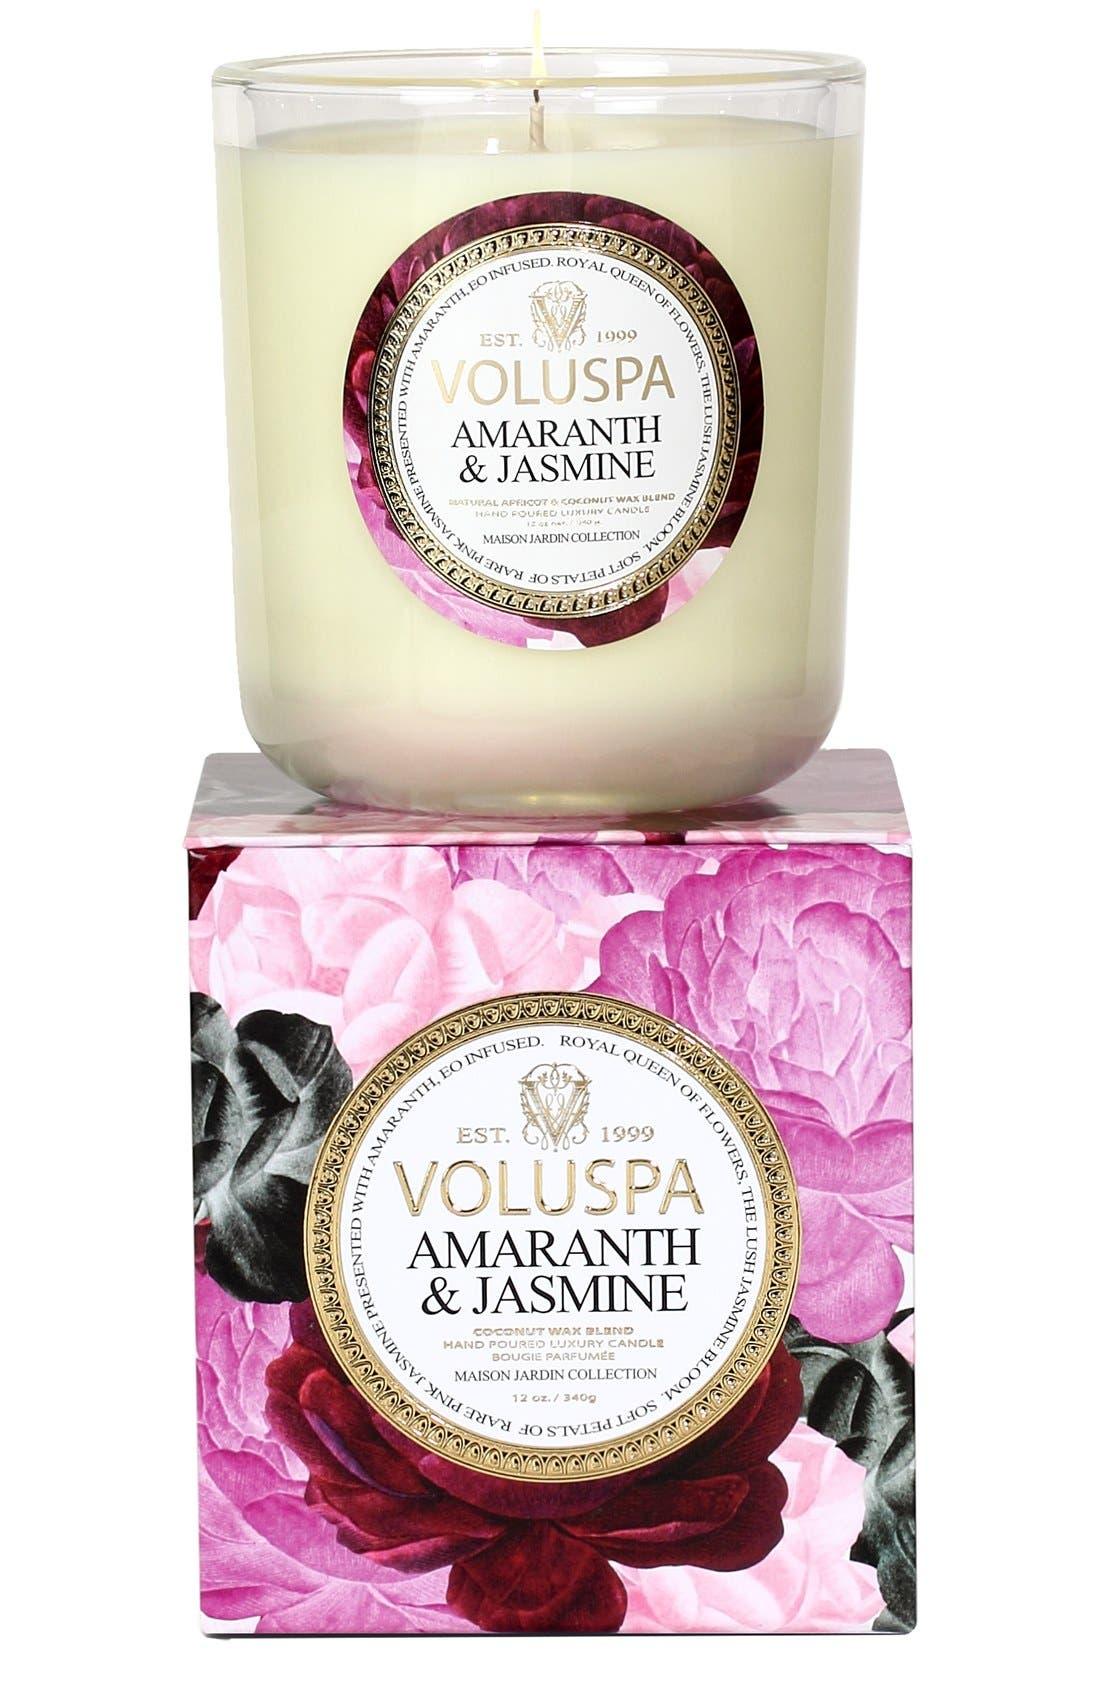 Maison Jardin Amaranth & Jasmine Classic Maison Candle,                             Main thumbnail 1, color,                             000